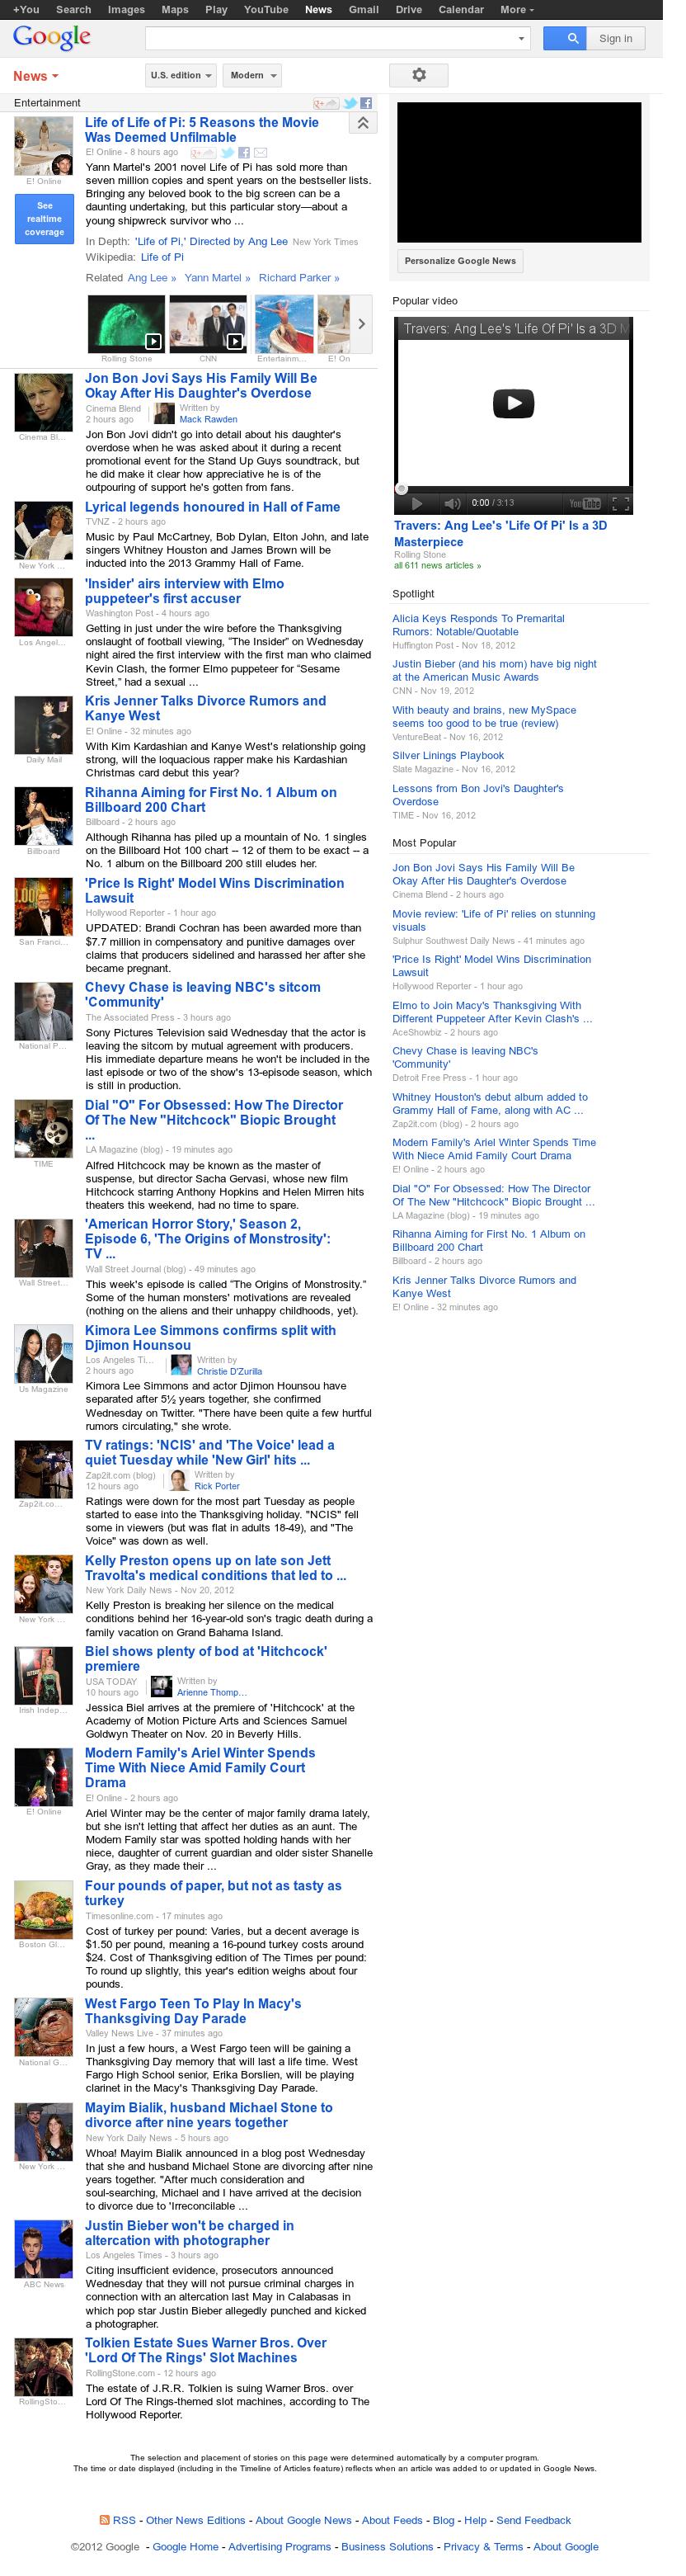 Google News: Entertainment at Thursday Nov. 22, 2012, 5:11 a.m. UTC